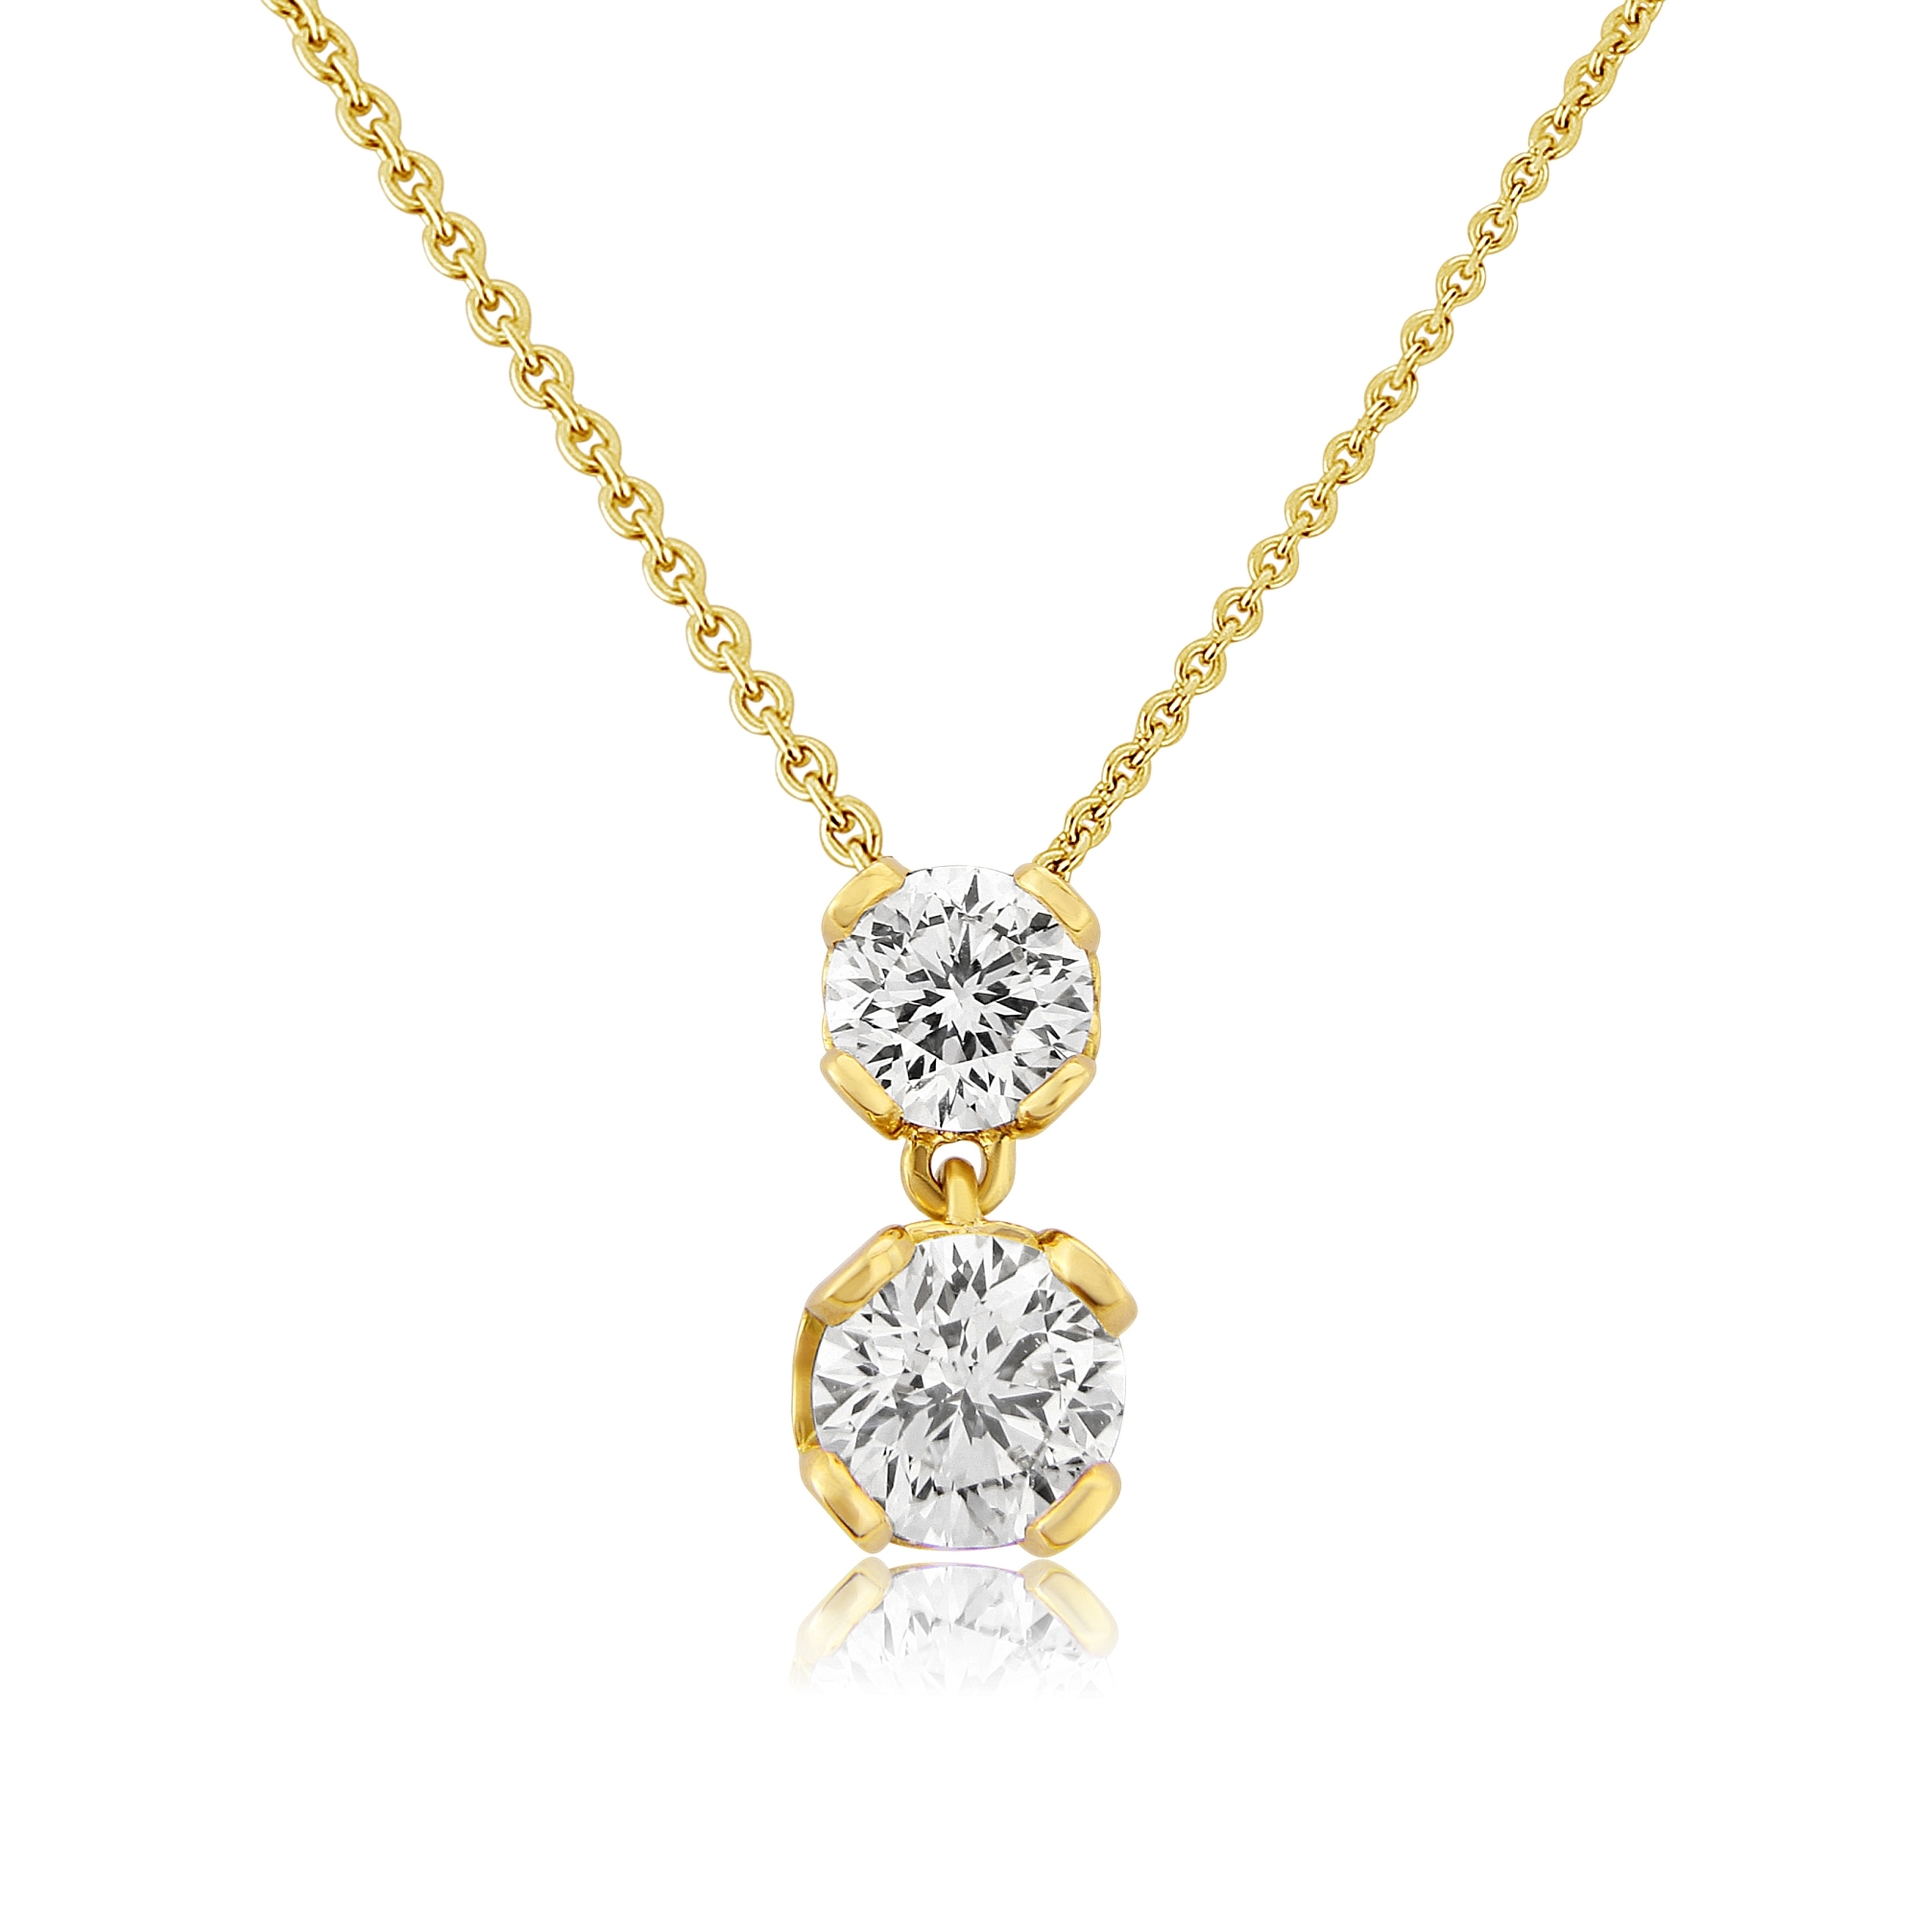 Signature Collection 18ct Yellow Gold Two Stone Diamond Set Pendant